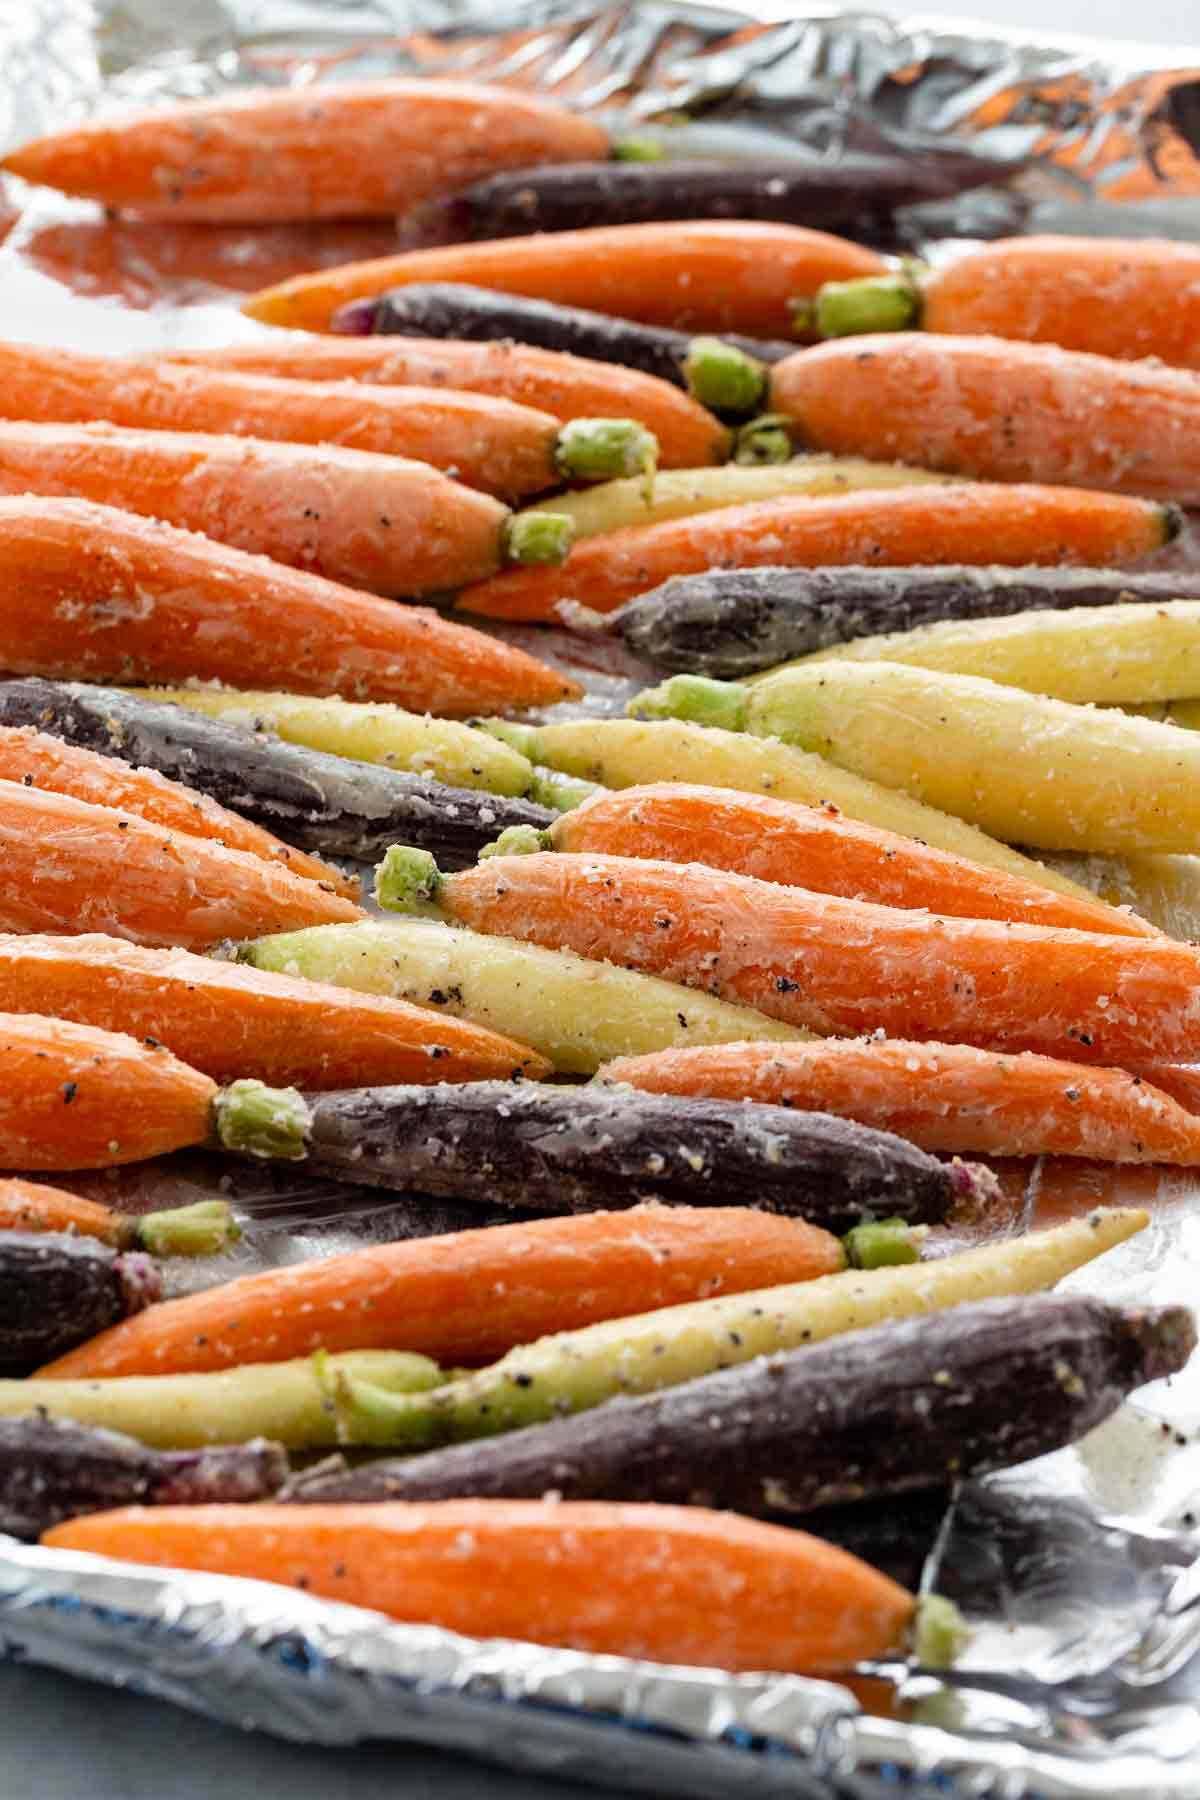 seasoned carrots lined up on a foil-lined baking sheet